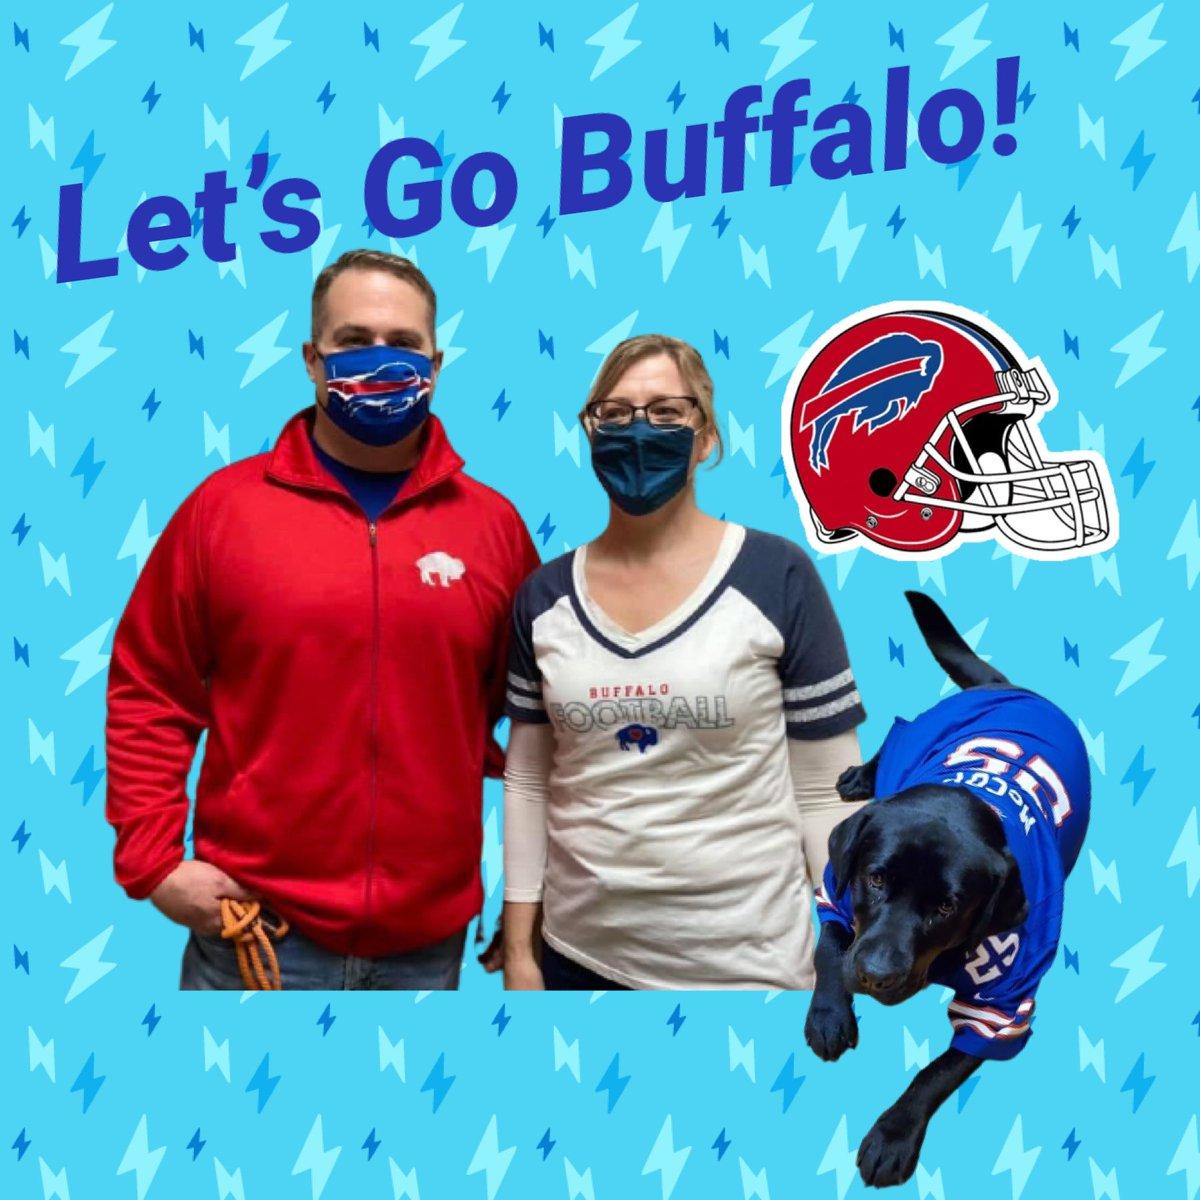 Student Government sponsored Buffalo Bills Spirit Day yesterday and today! Even Mr. Wojcik's pup Charlie got into the act,  sporting her McCoy jersey! GO BILLS! #BillsMafia #gobills #nceaglespride 💙🏈❤️